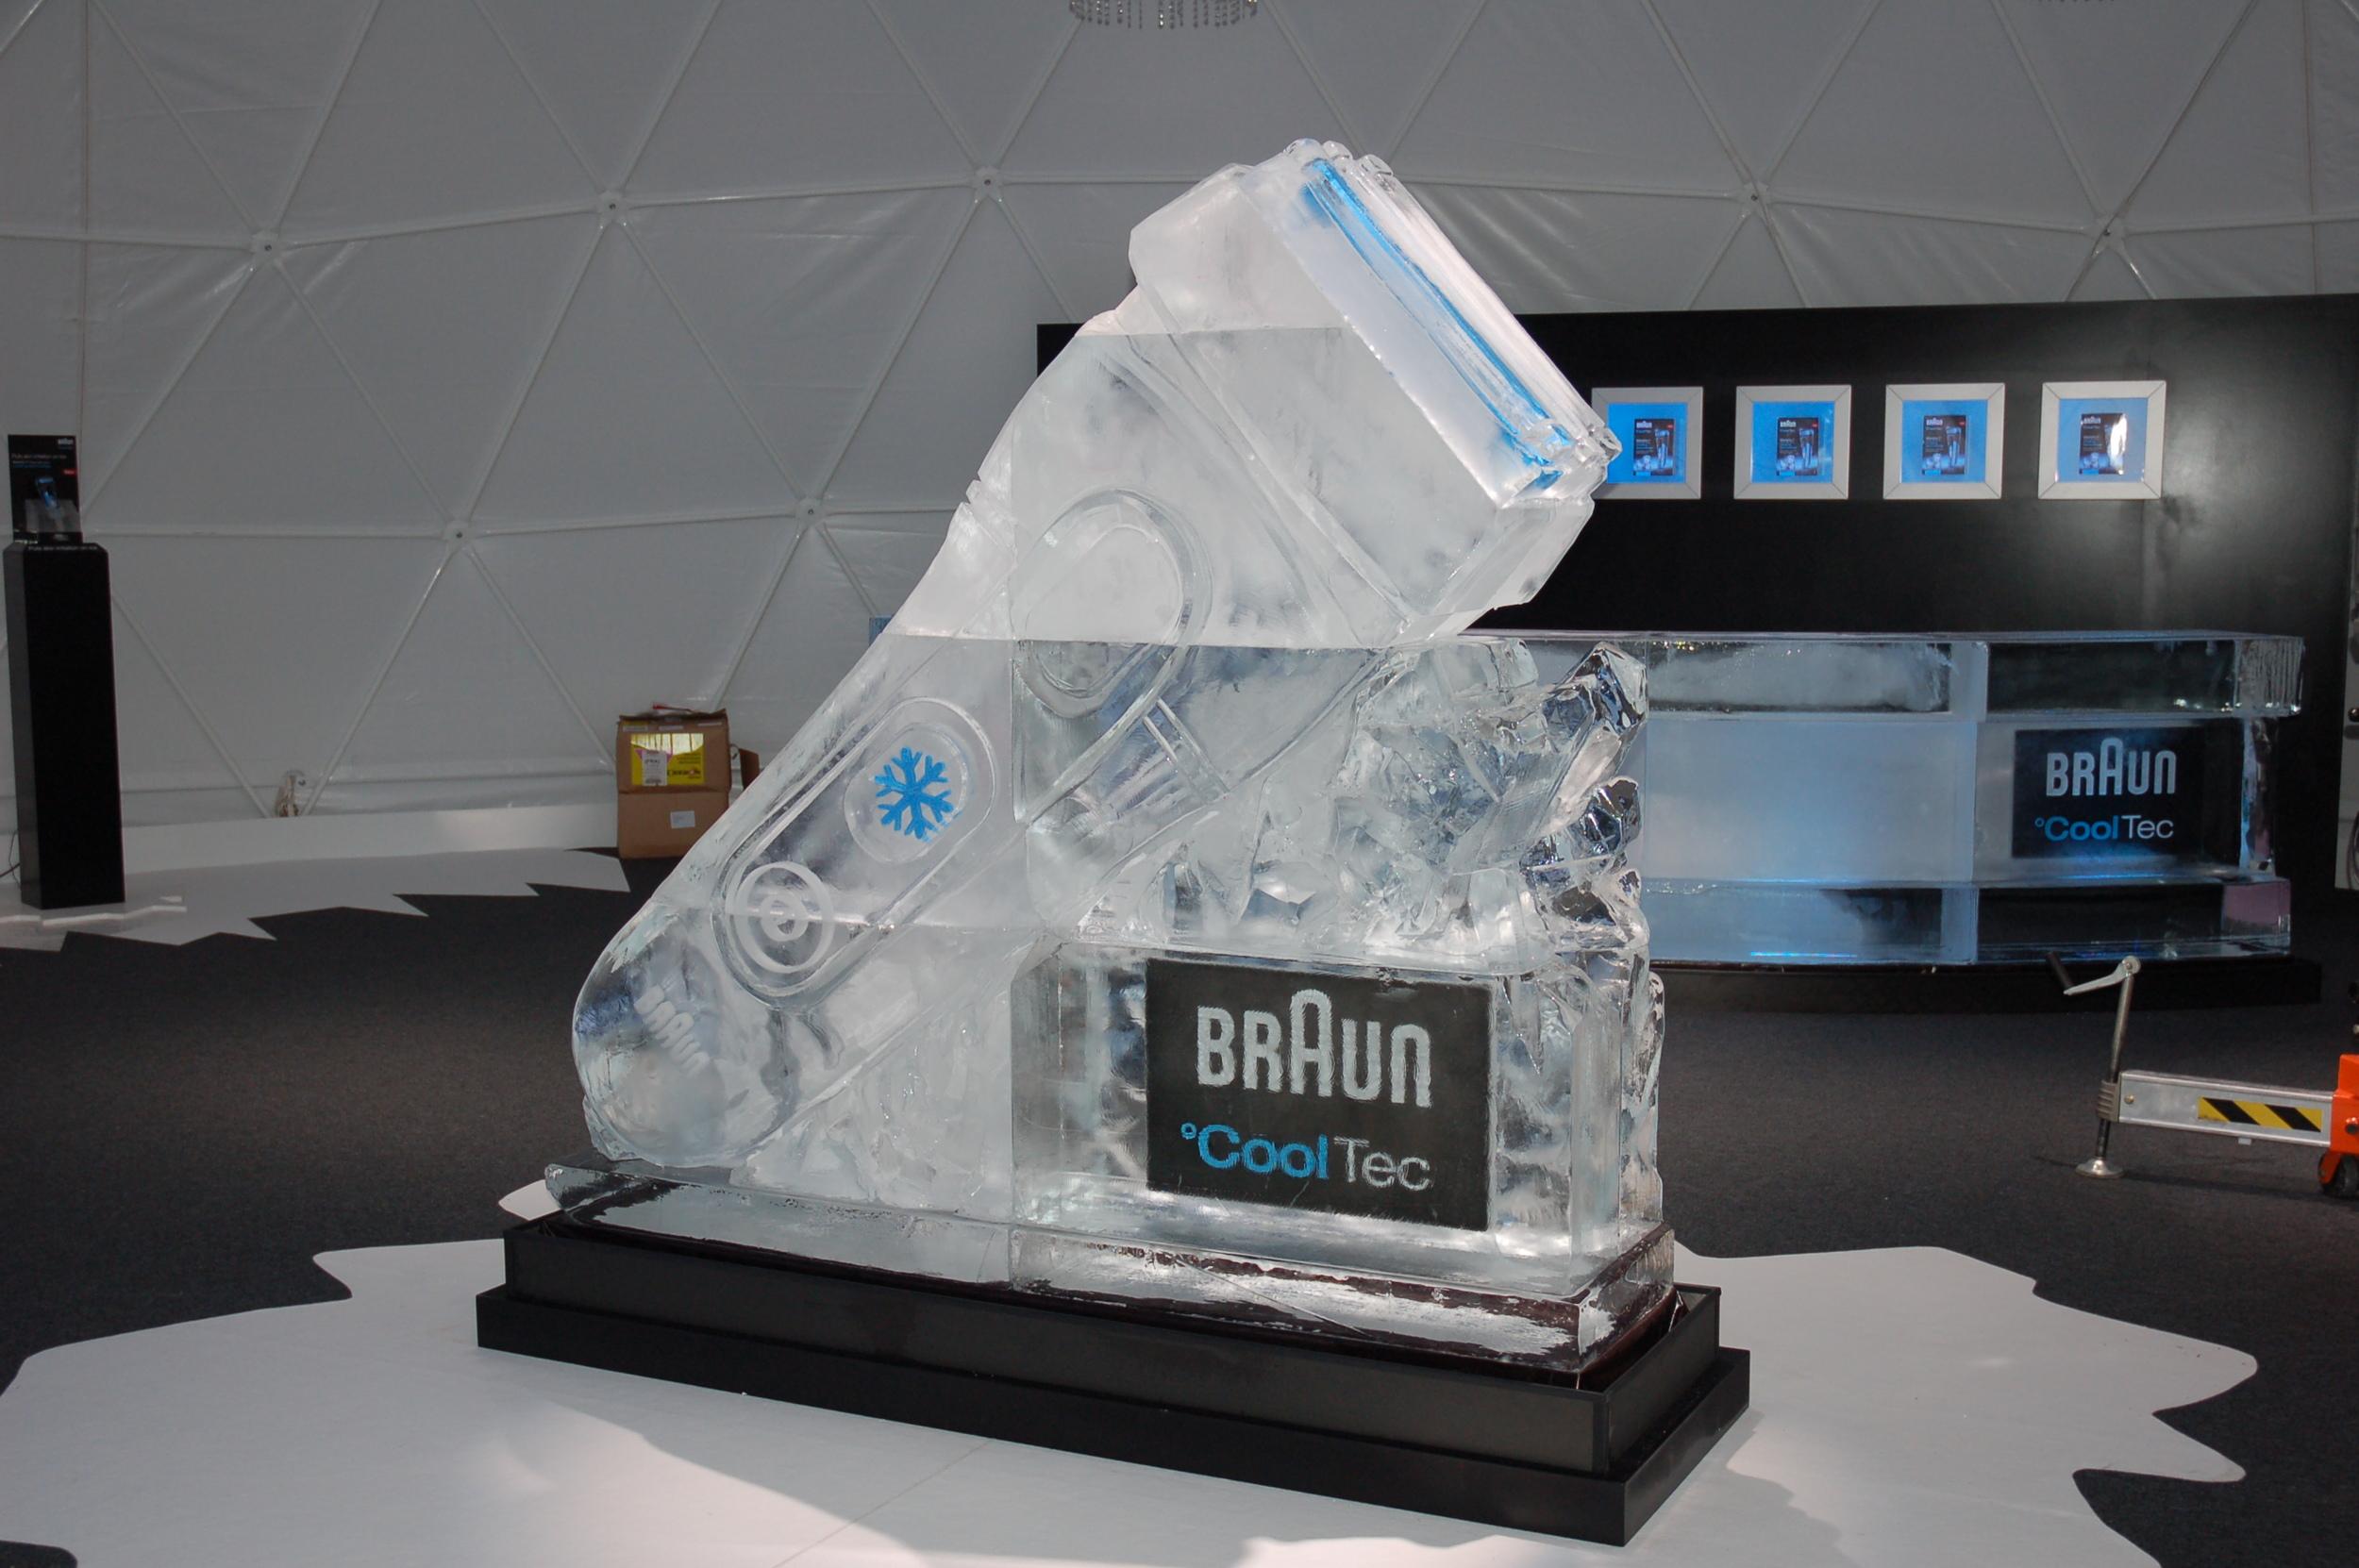 Large Braun Shaver Ice Sculpture